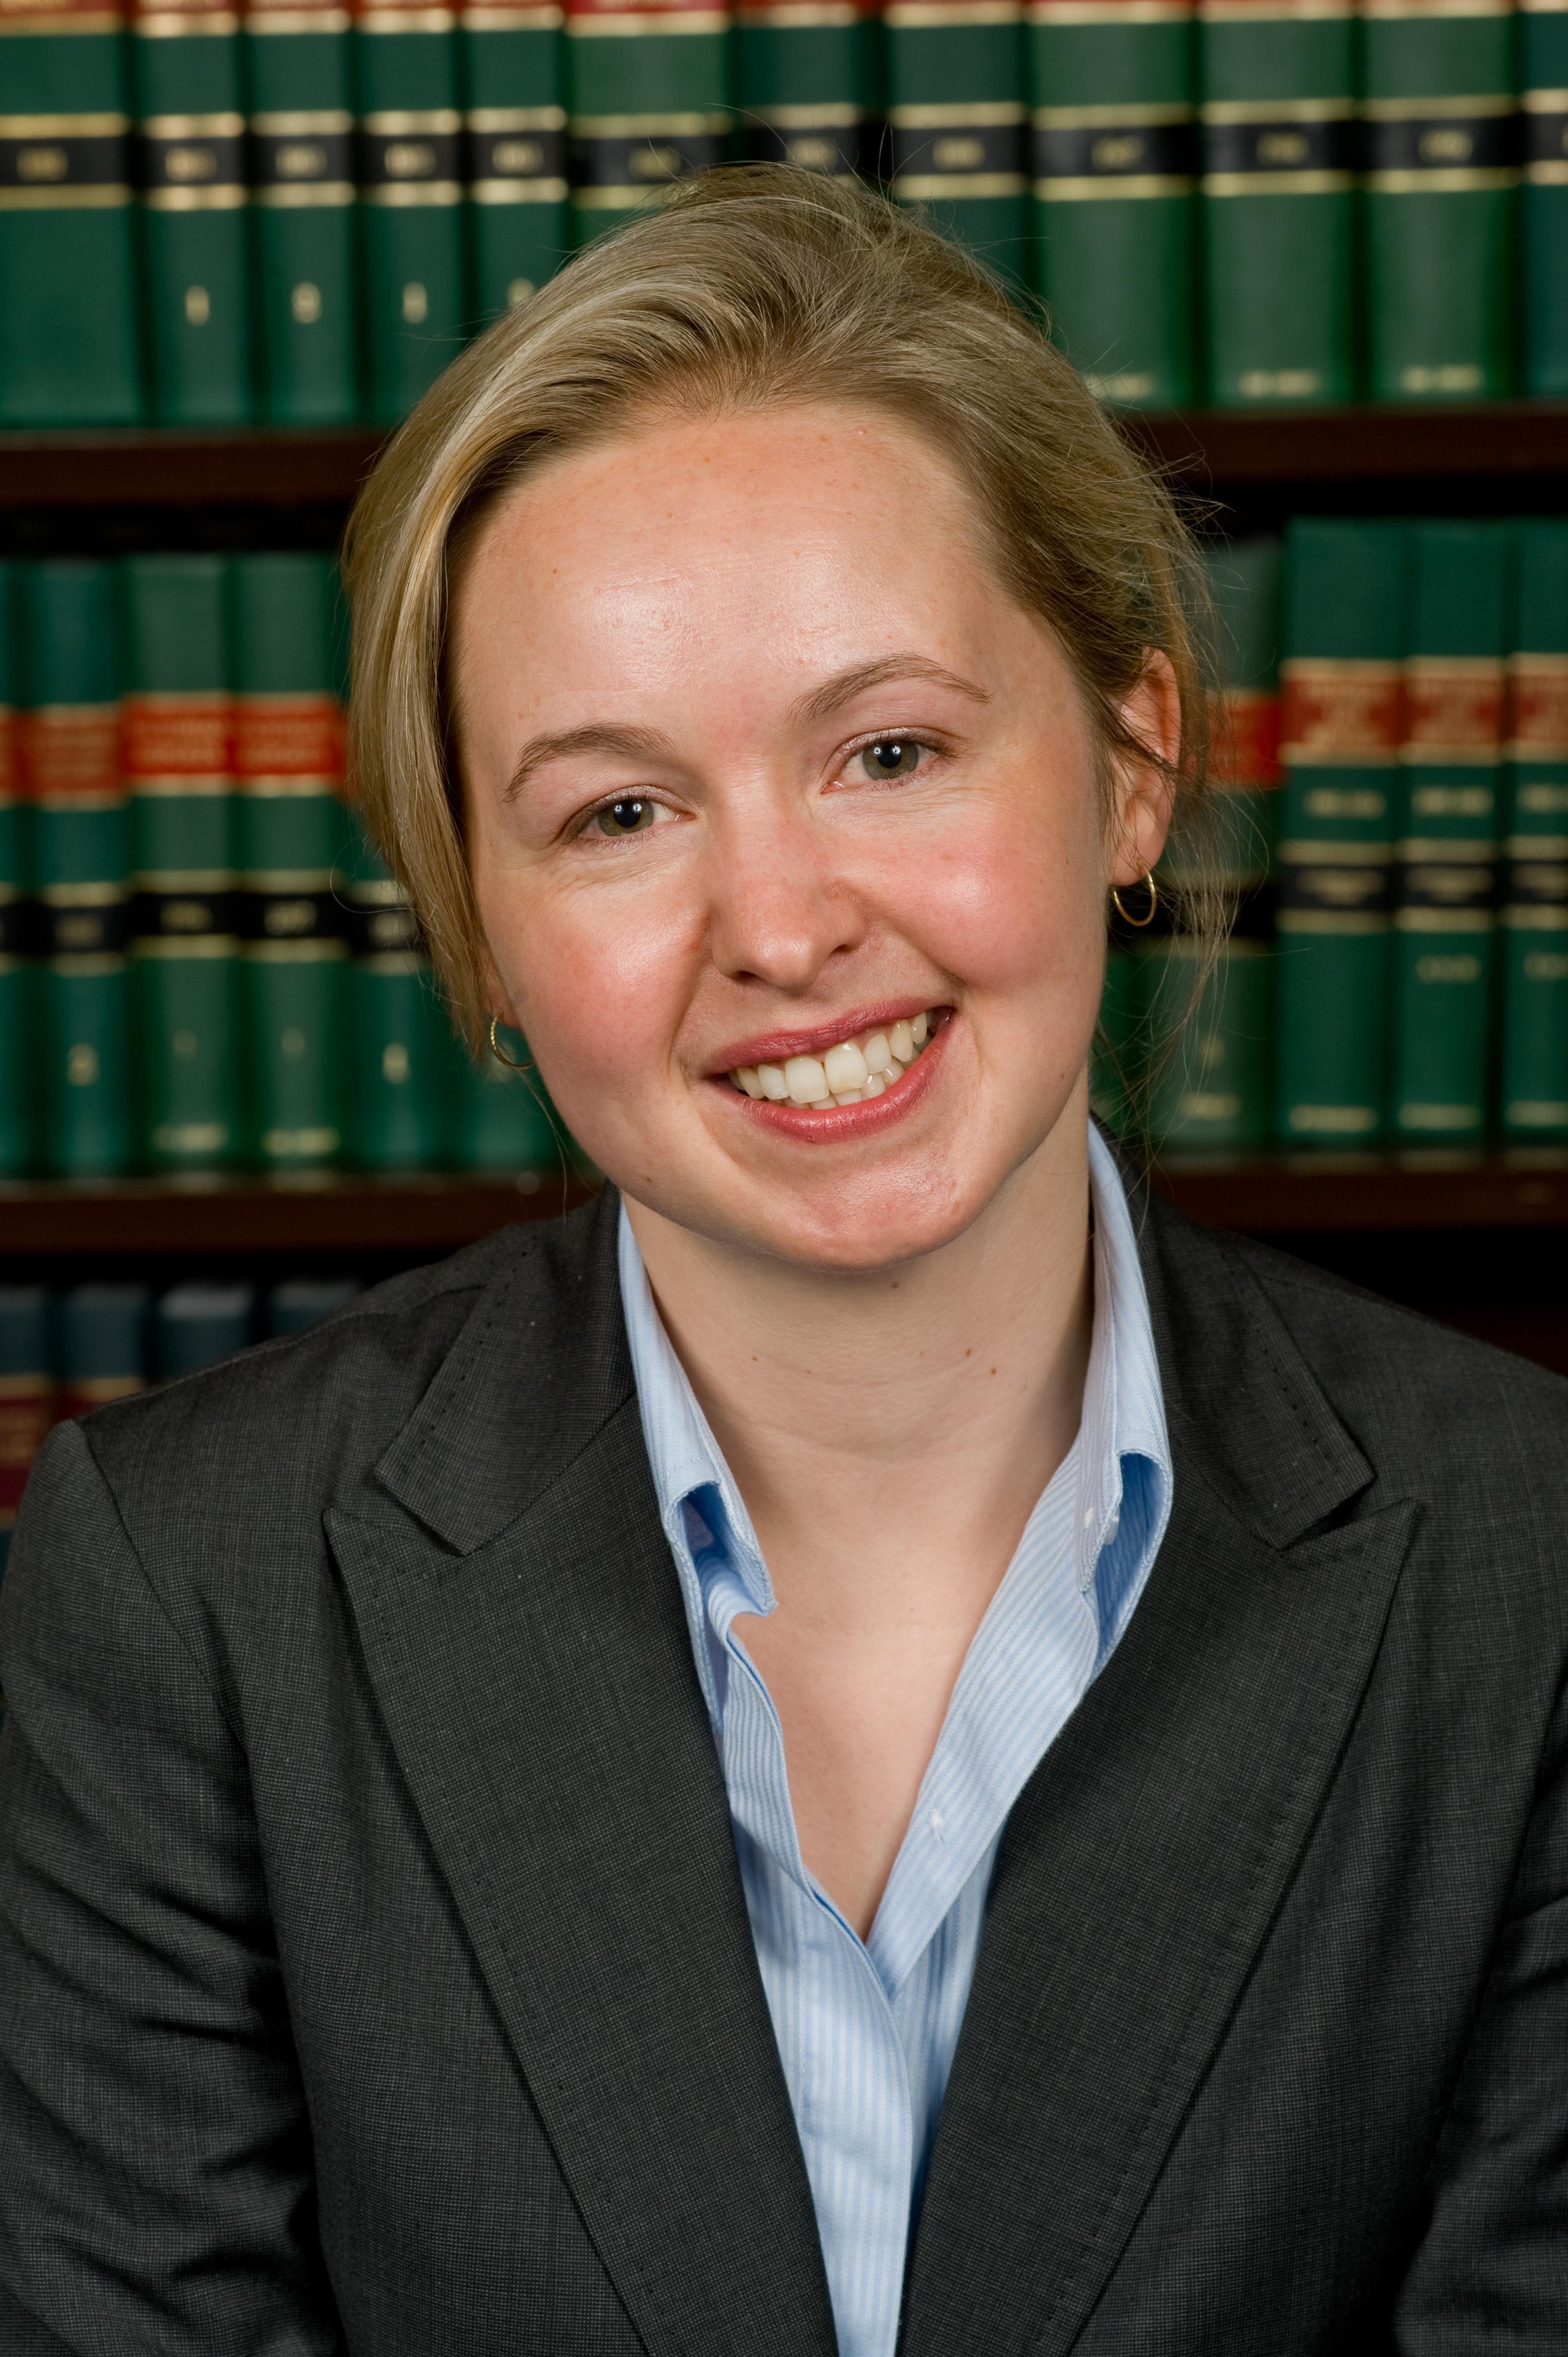 Rebecca Brezzi, BA, JD (Melb), Grad Dip (BusSys) (RMIT)